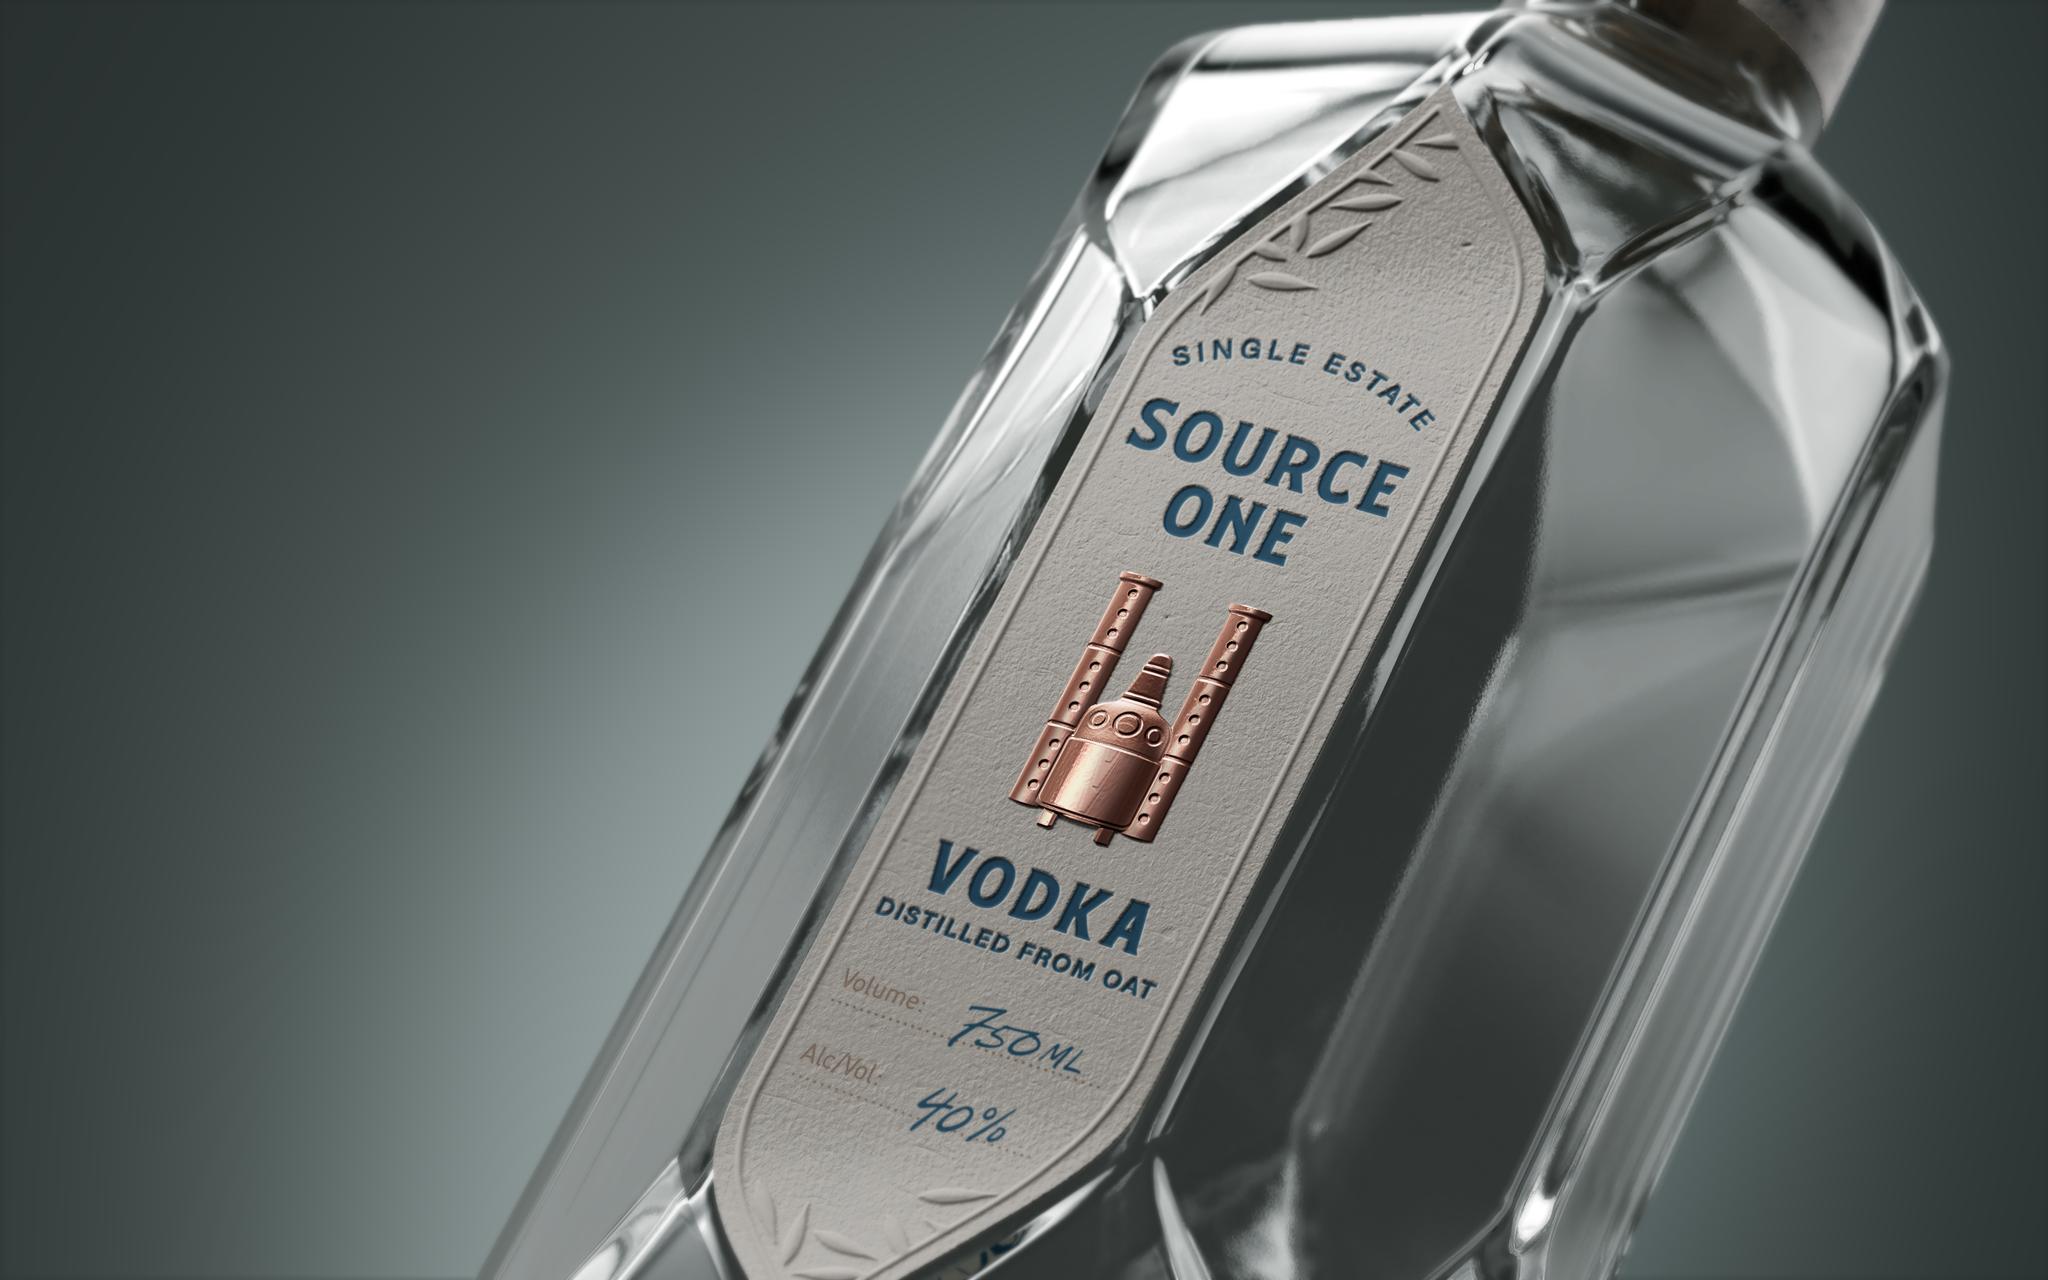 Source One Vodka